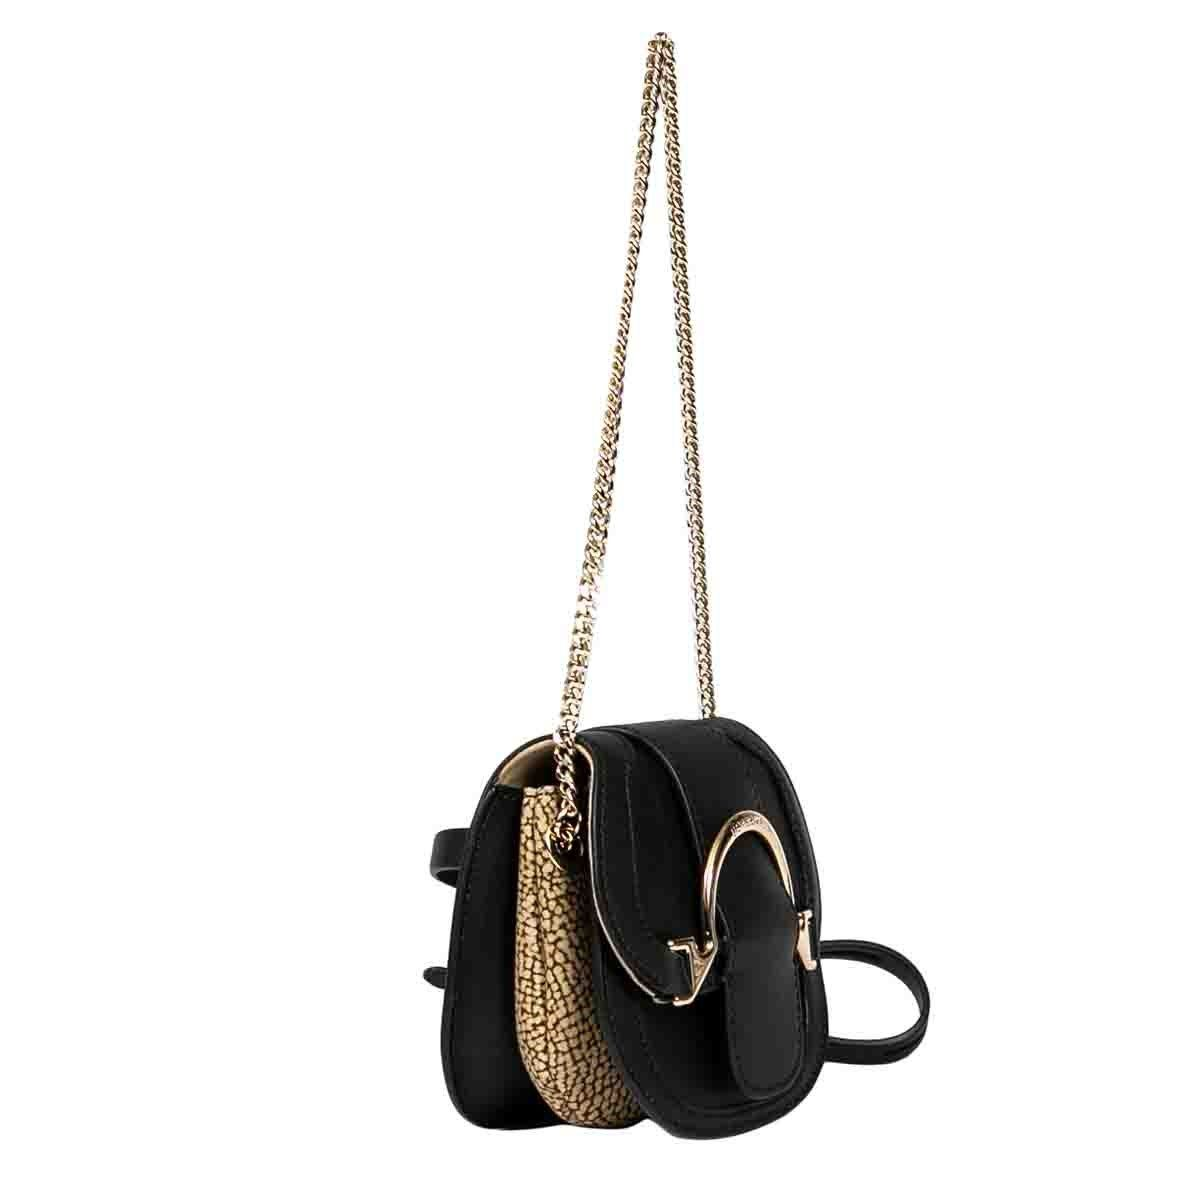 BORBONESE Leathers BORBONESE WOMEN'S BLACK LEATHER SHOULDER BAG